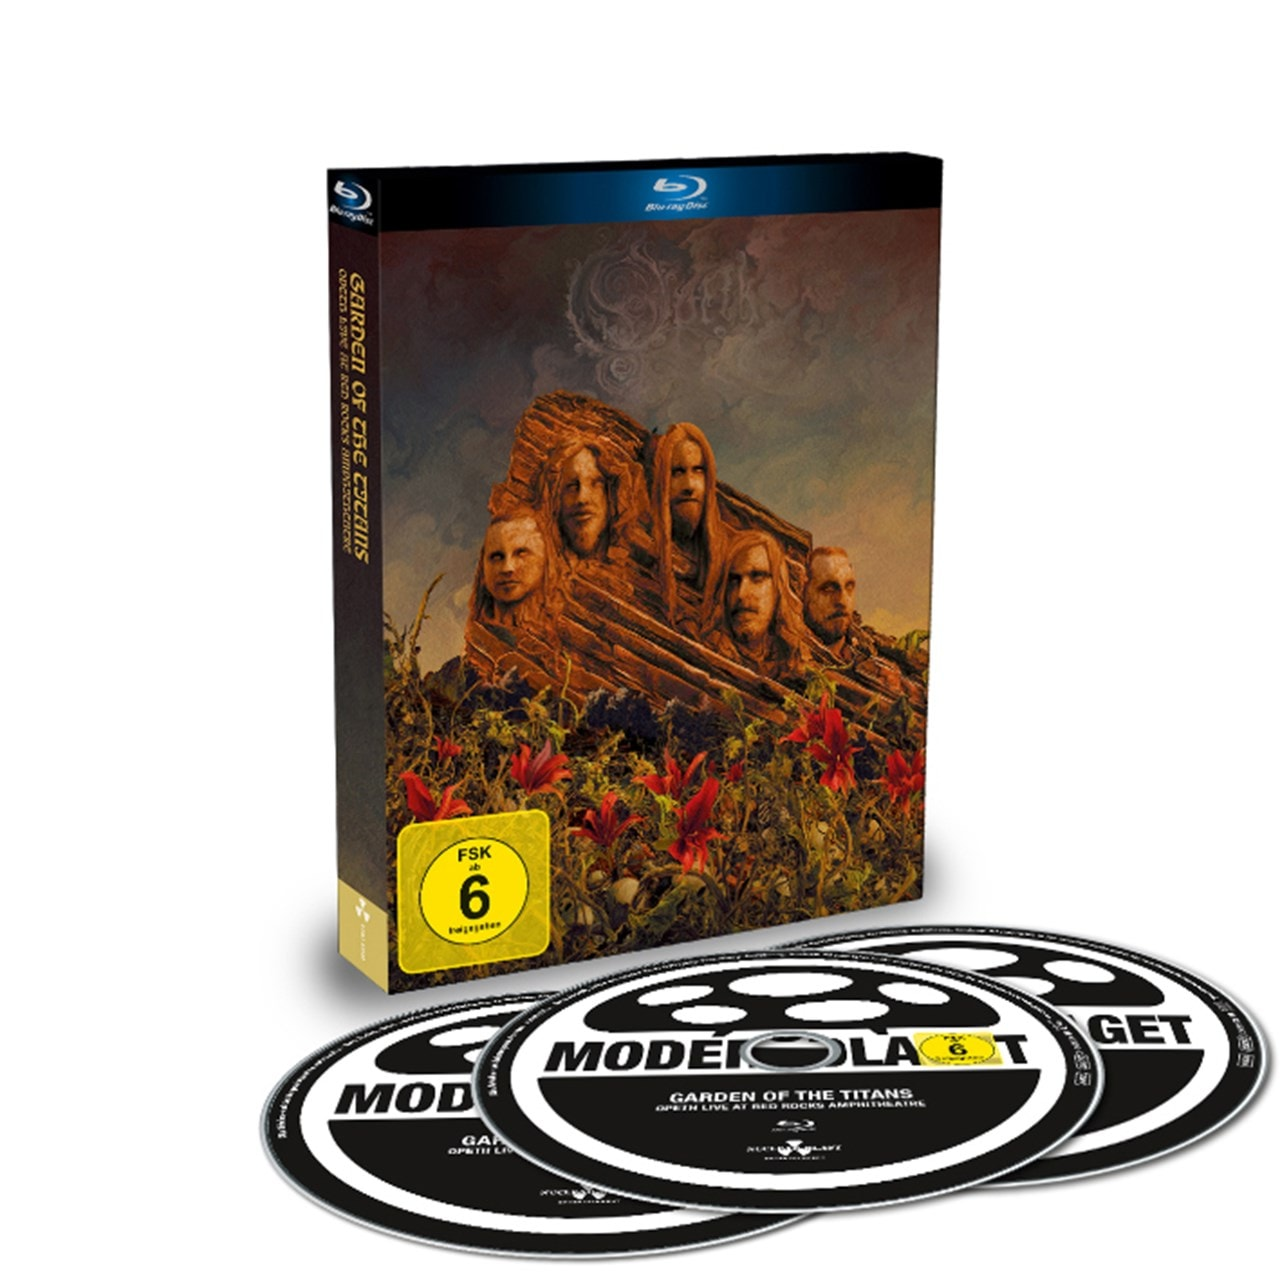 Garden of the Titans (Live) - 1